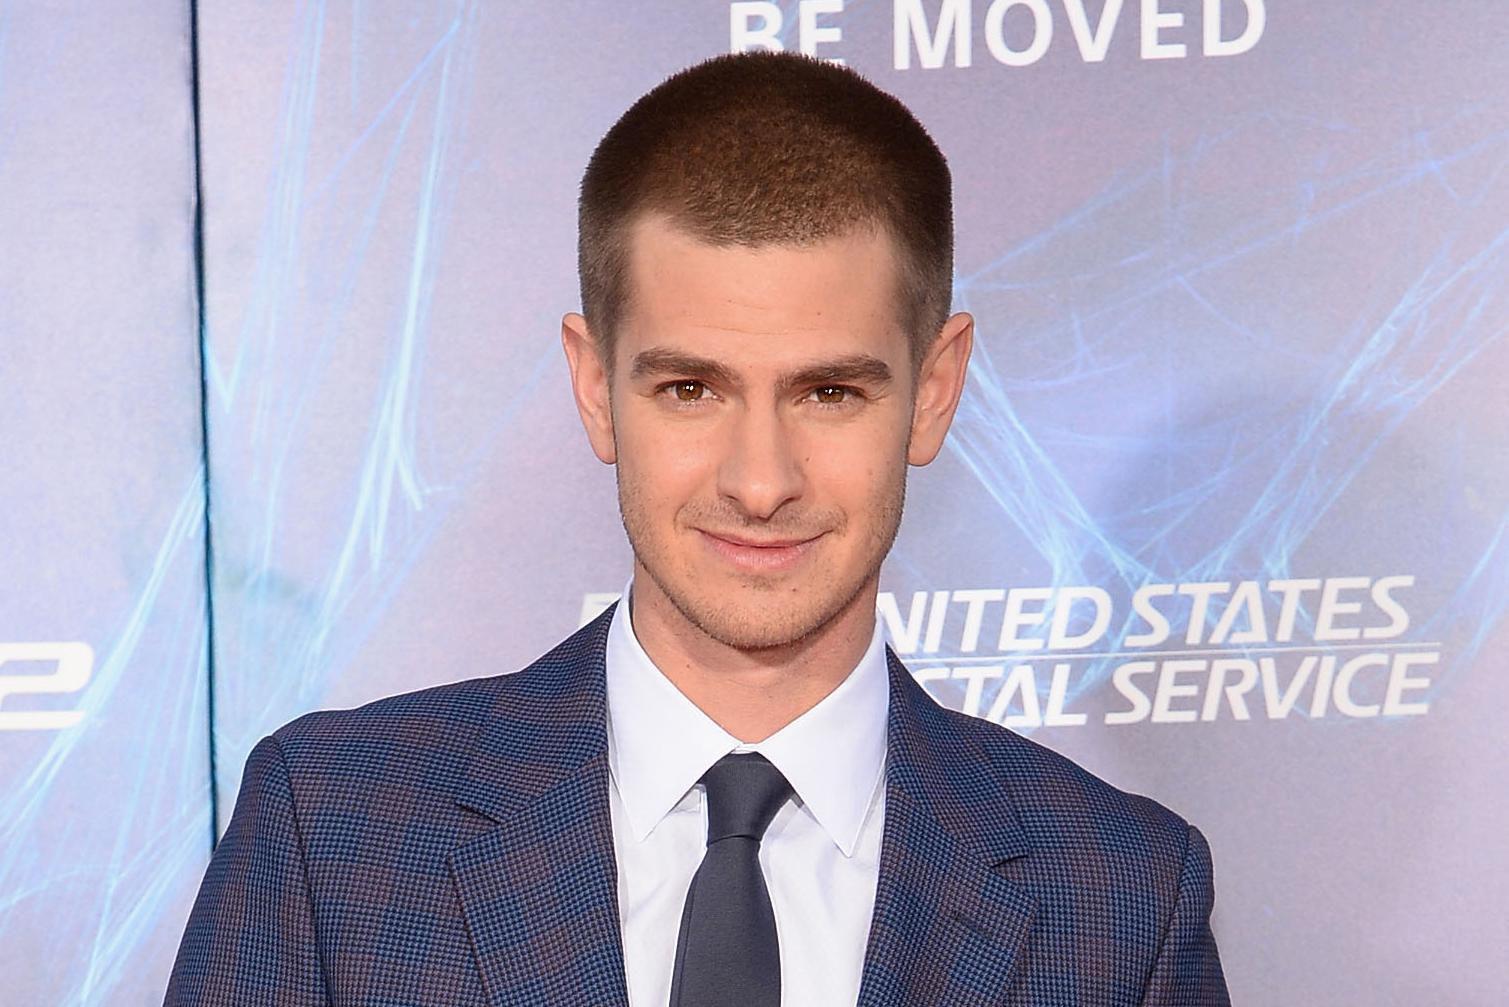 Buzz Cut Hair Styles: Top Buzz Cut Looks For Men